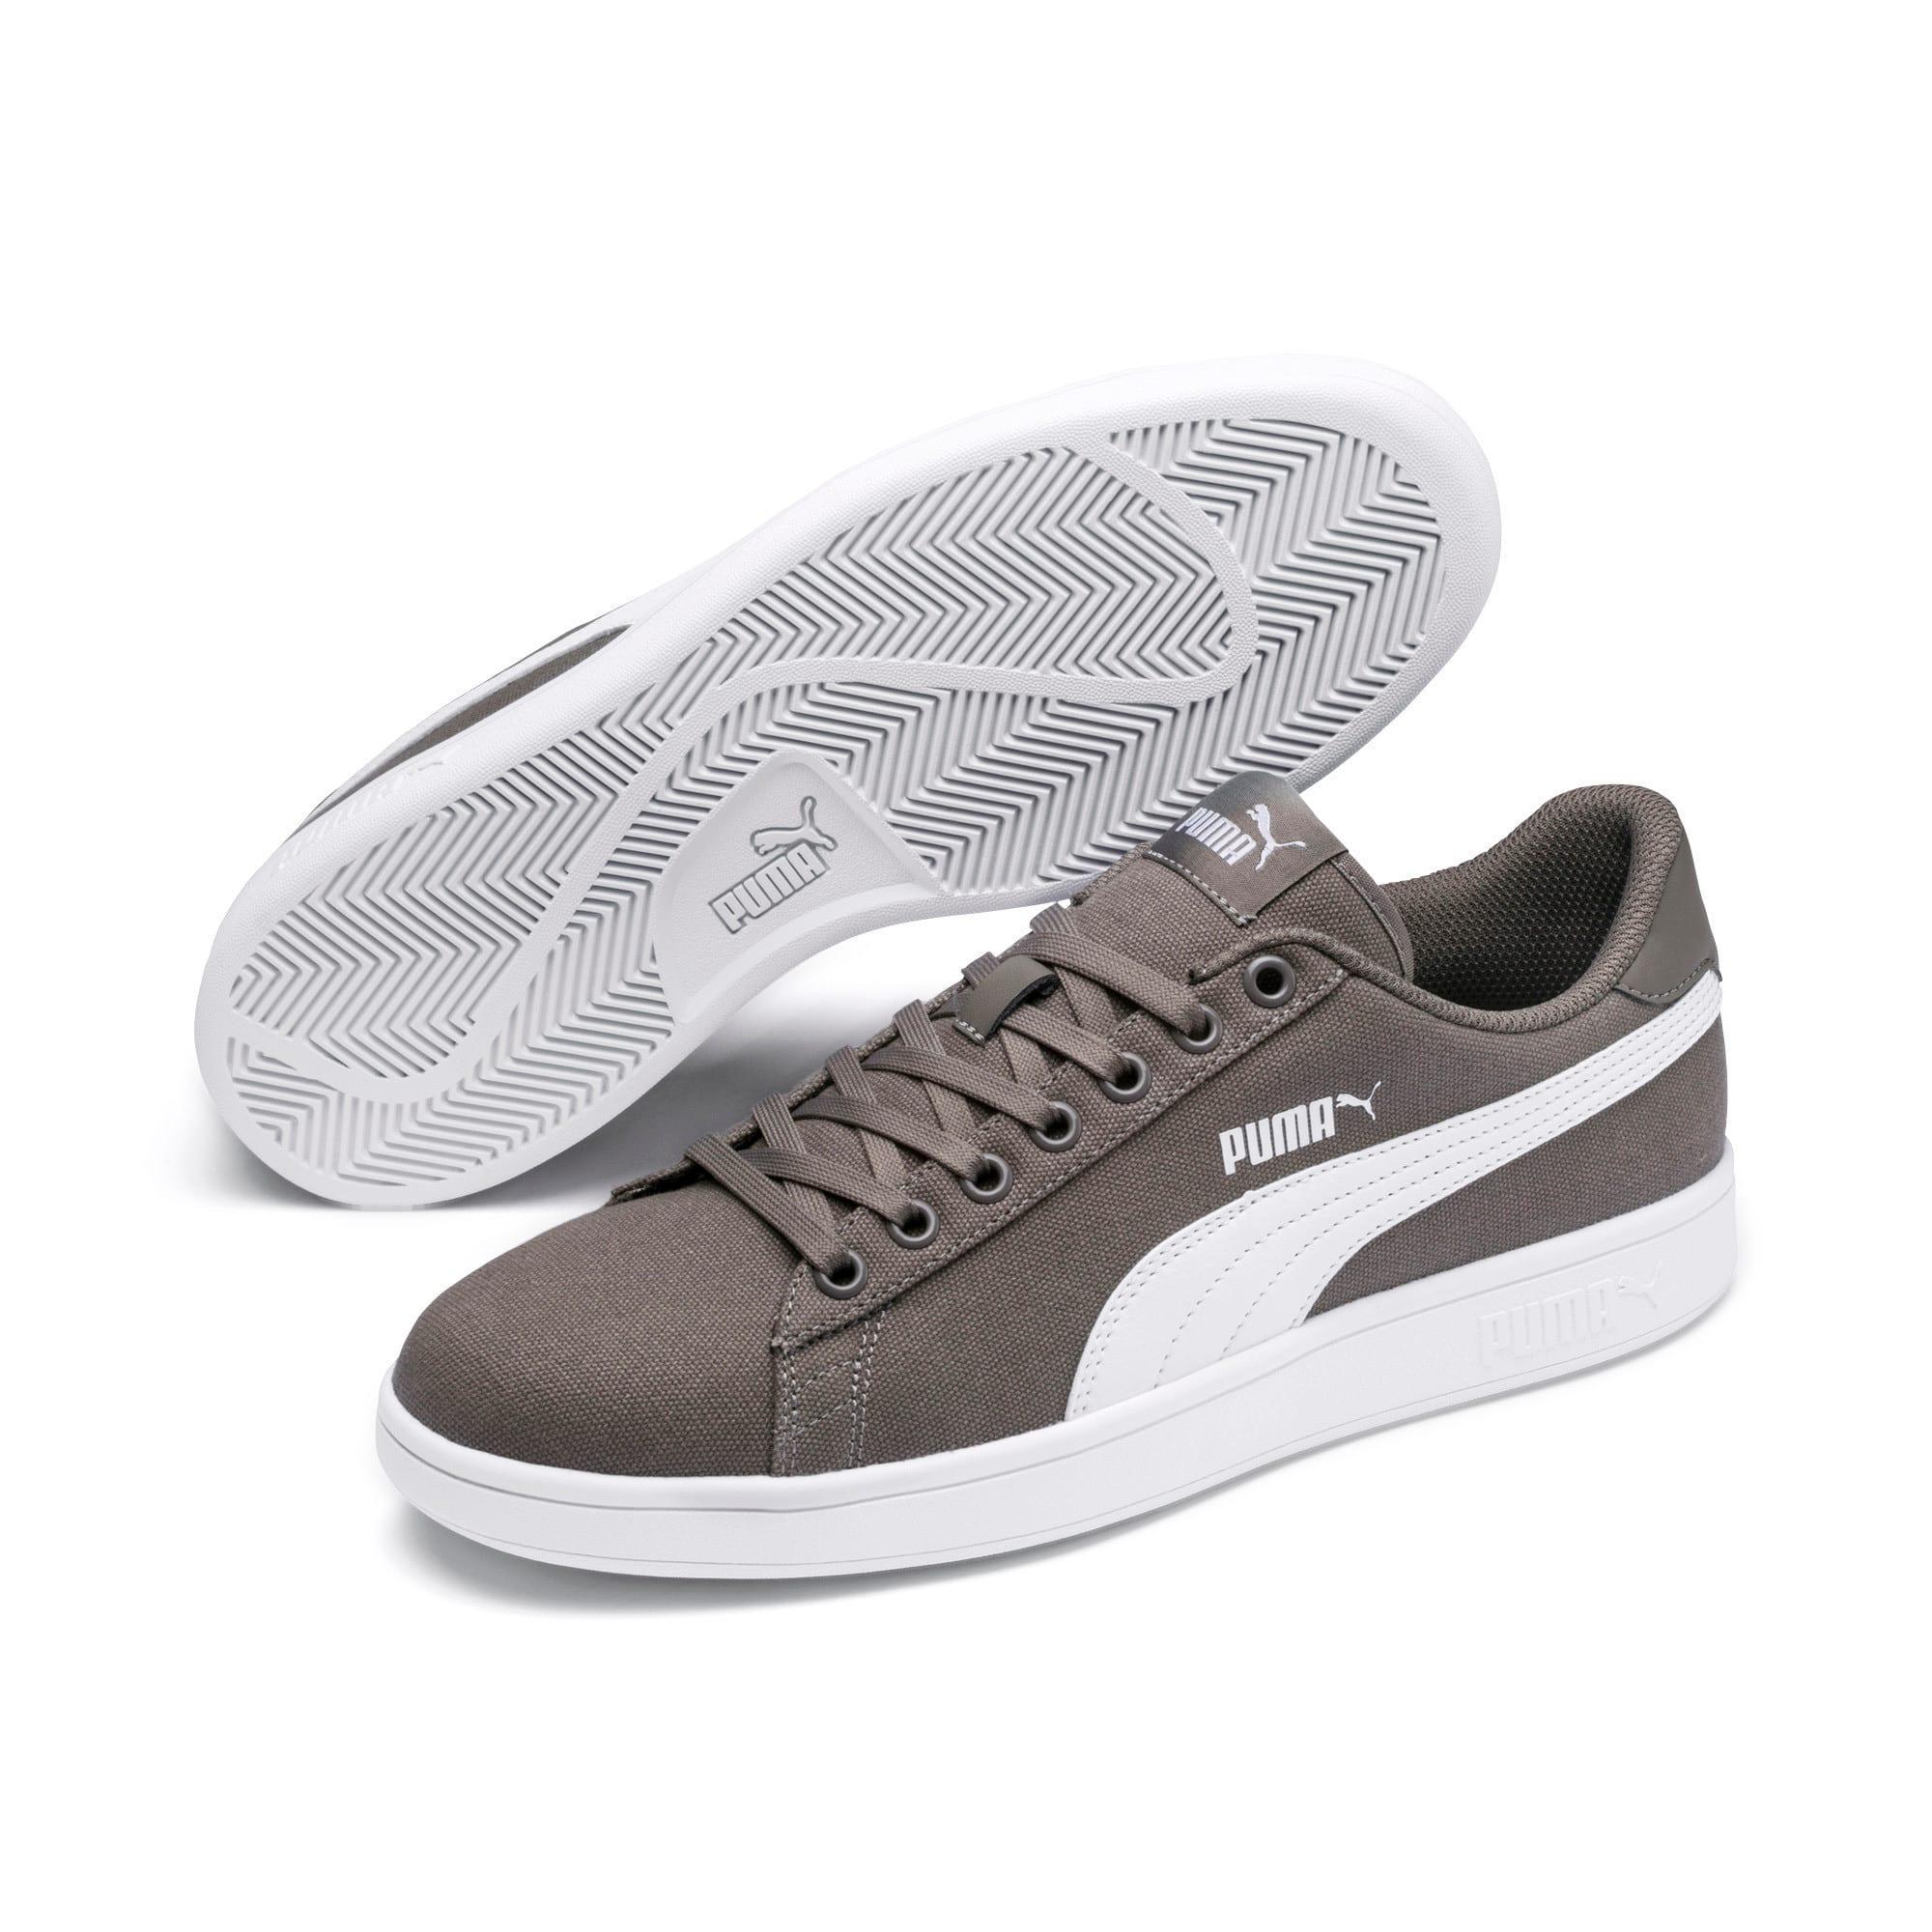 Thumbnail 2 of PUMA Smash v2 Sneakers, Charcoal Gray-Puma White, medium-IND